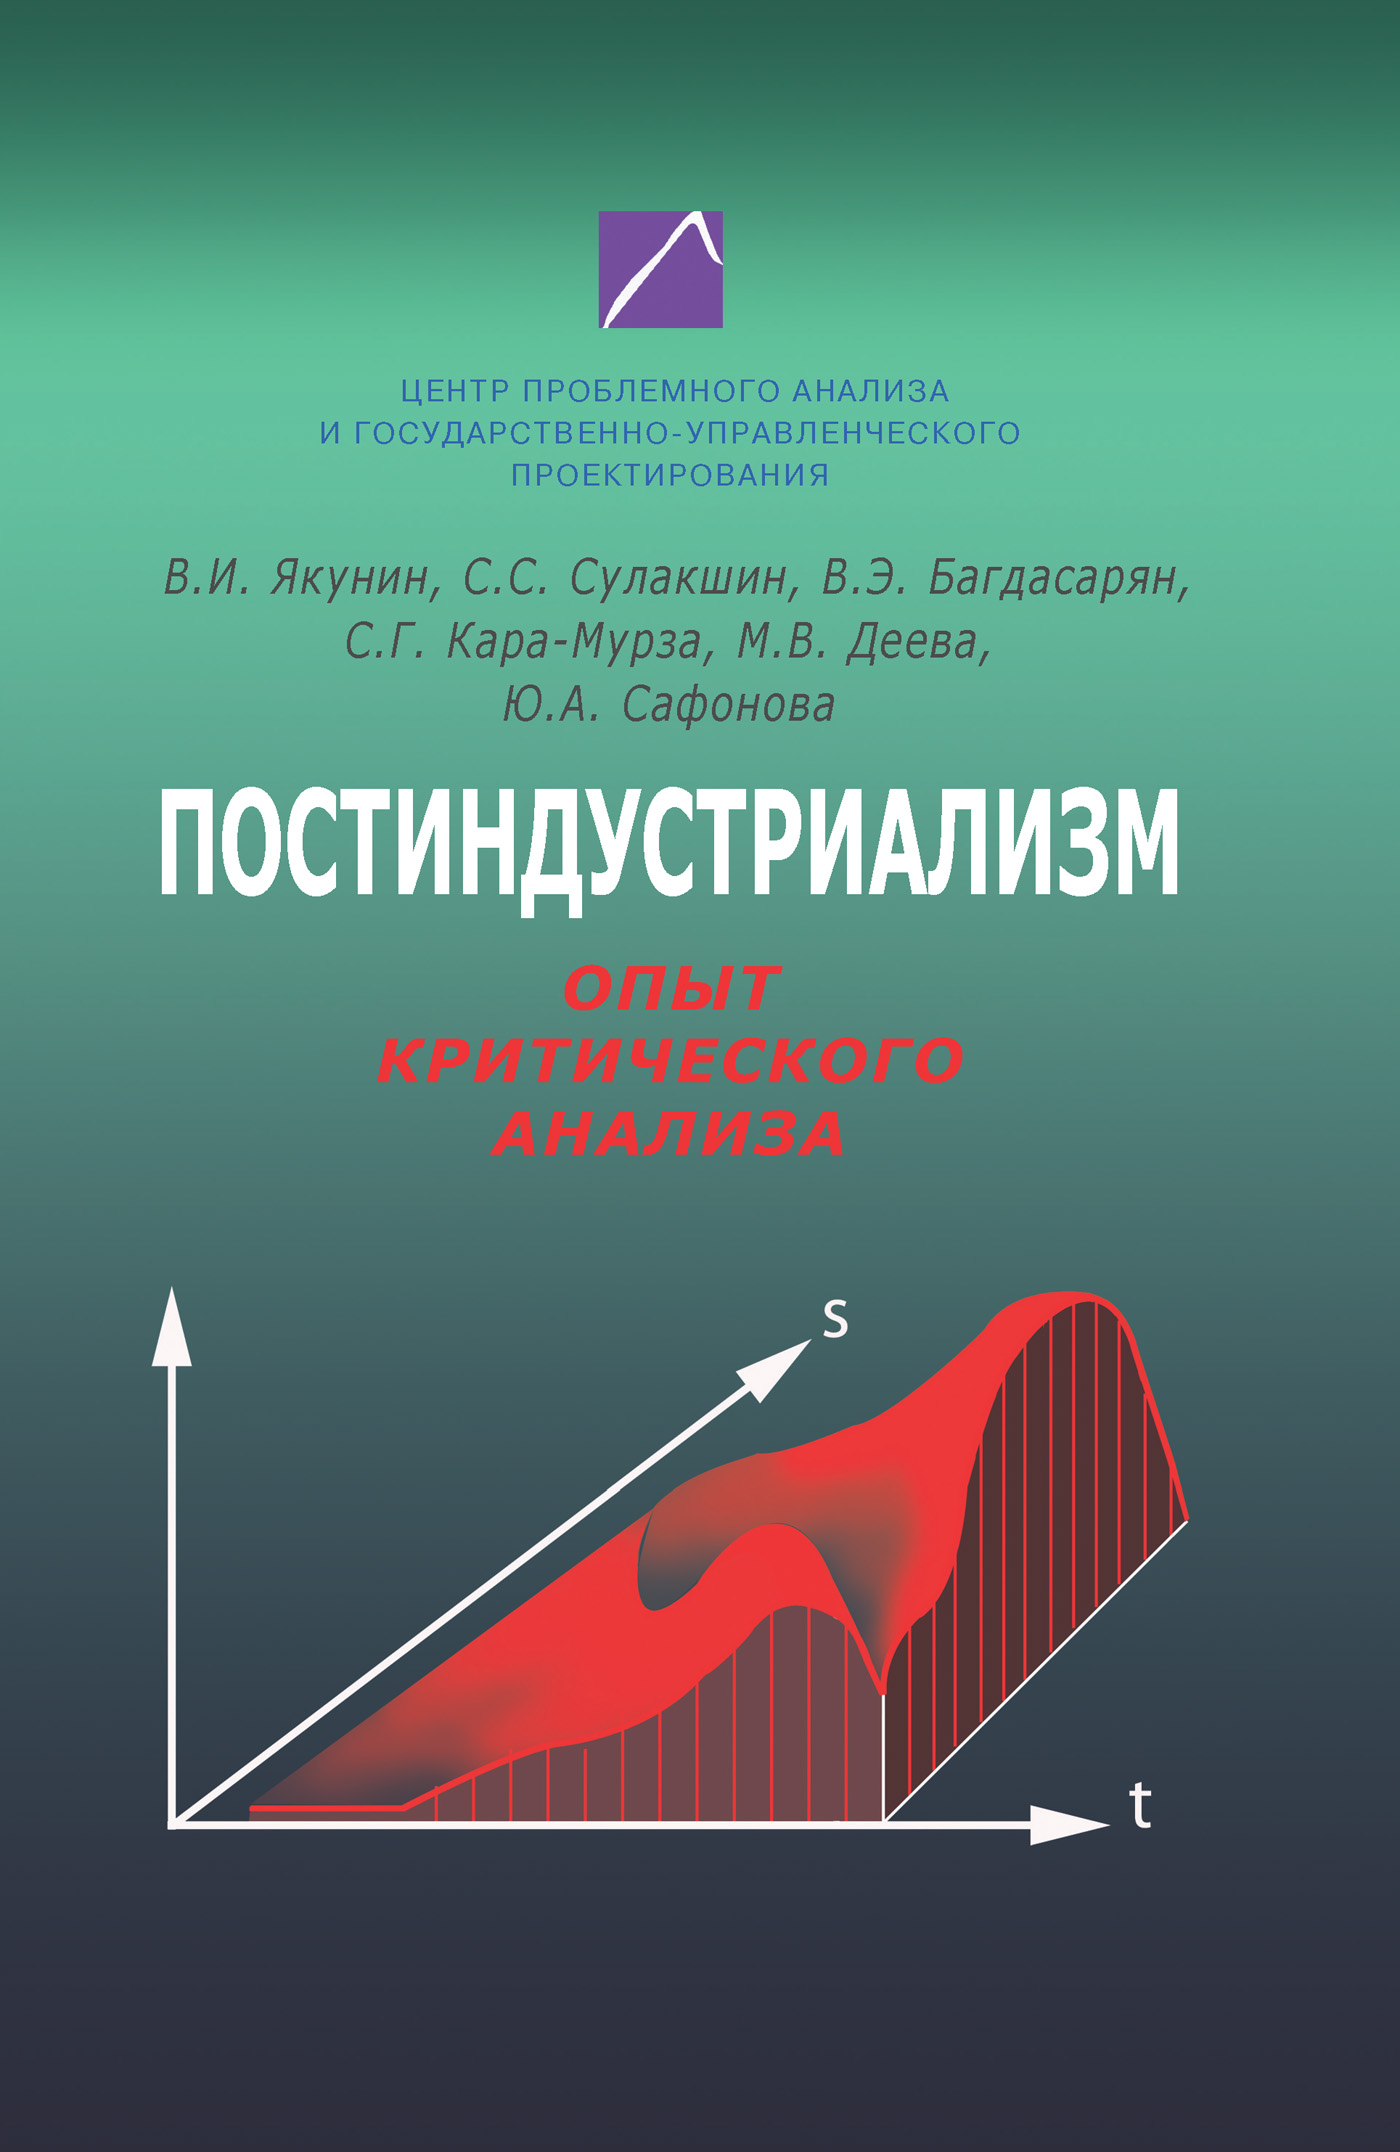 Сергей Кара-Мурза Постиндустриализм. Опыт критического анализа